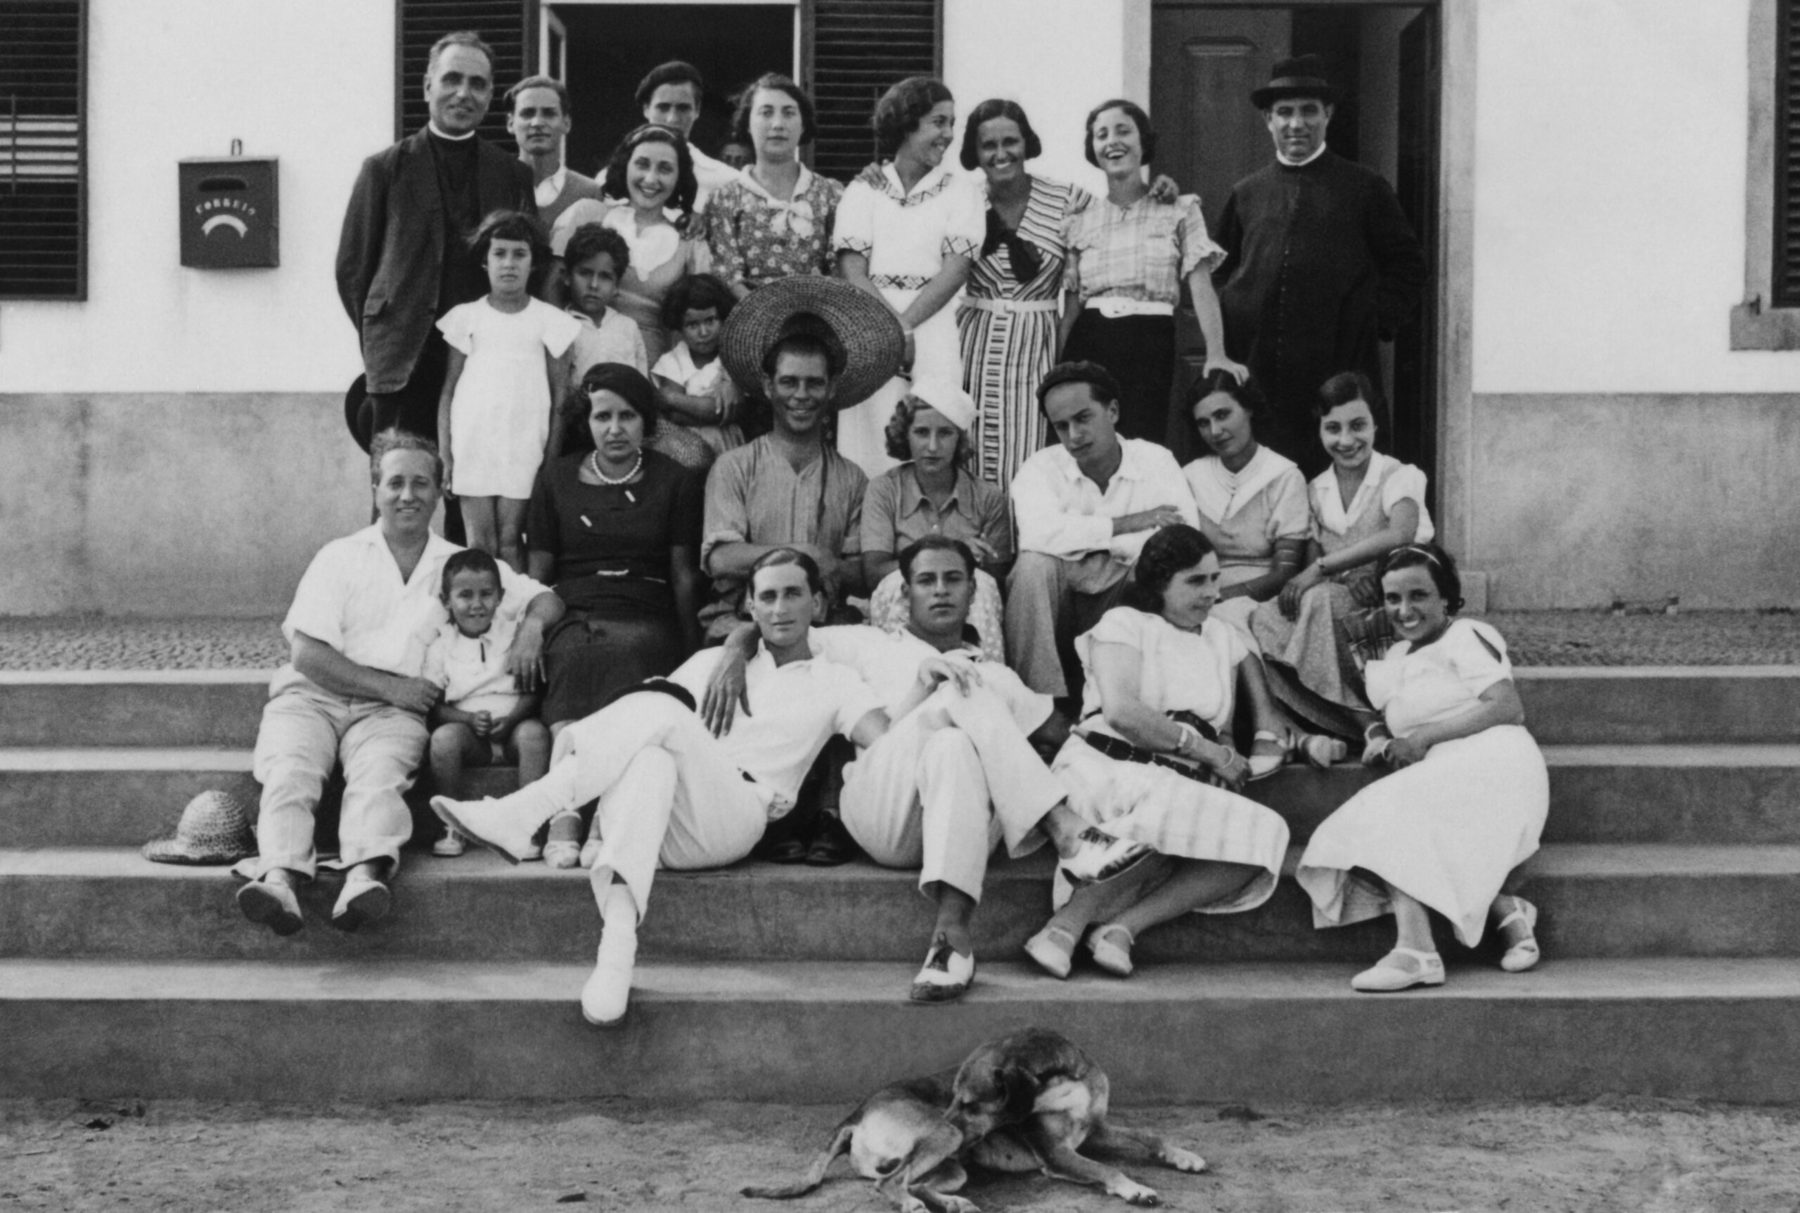 Album V: Family/Love, Porto Sant, Madeira, 1934